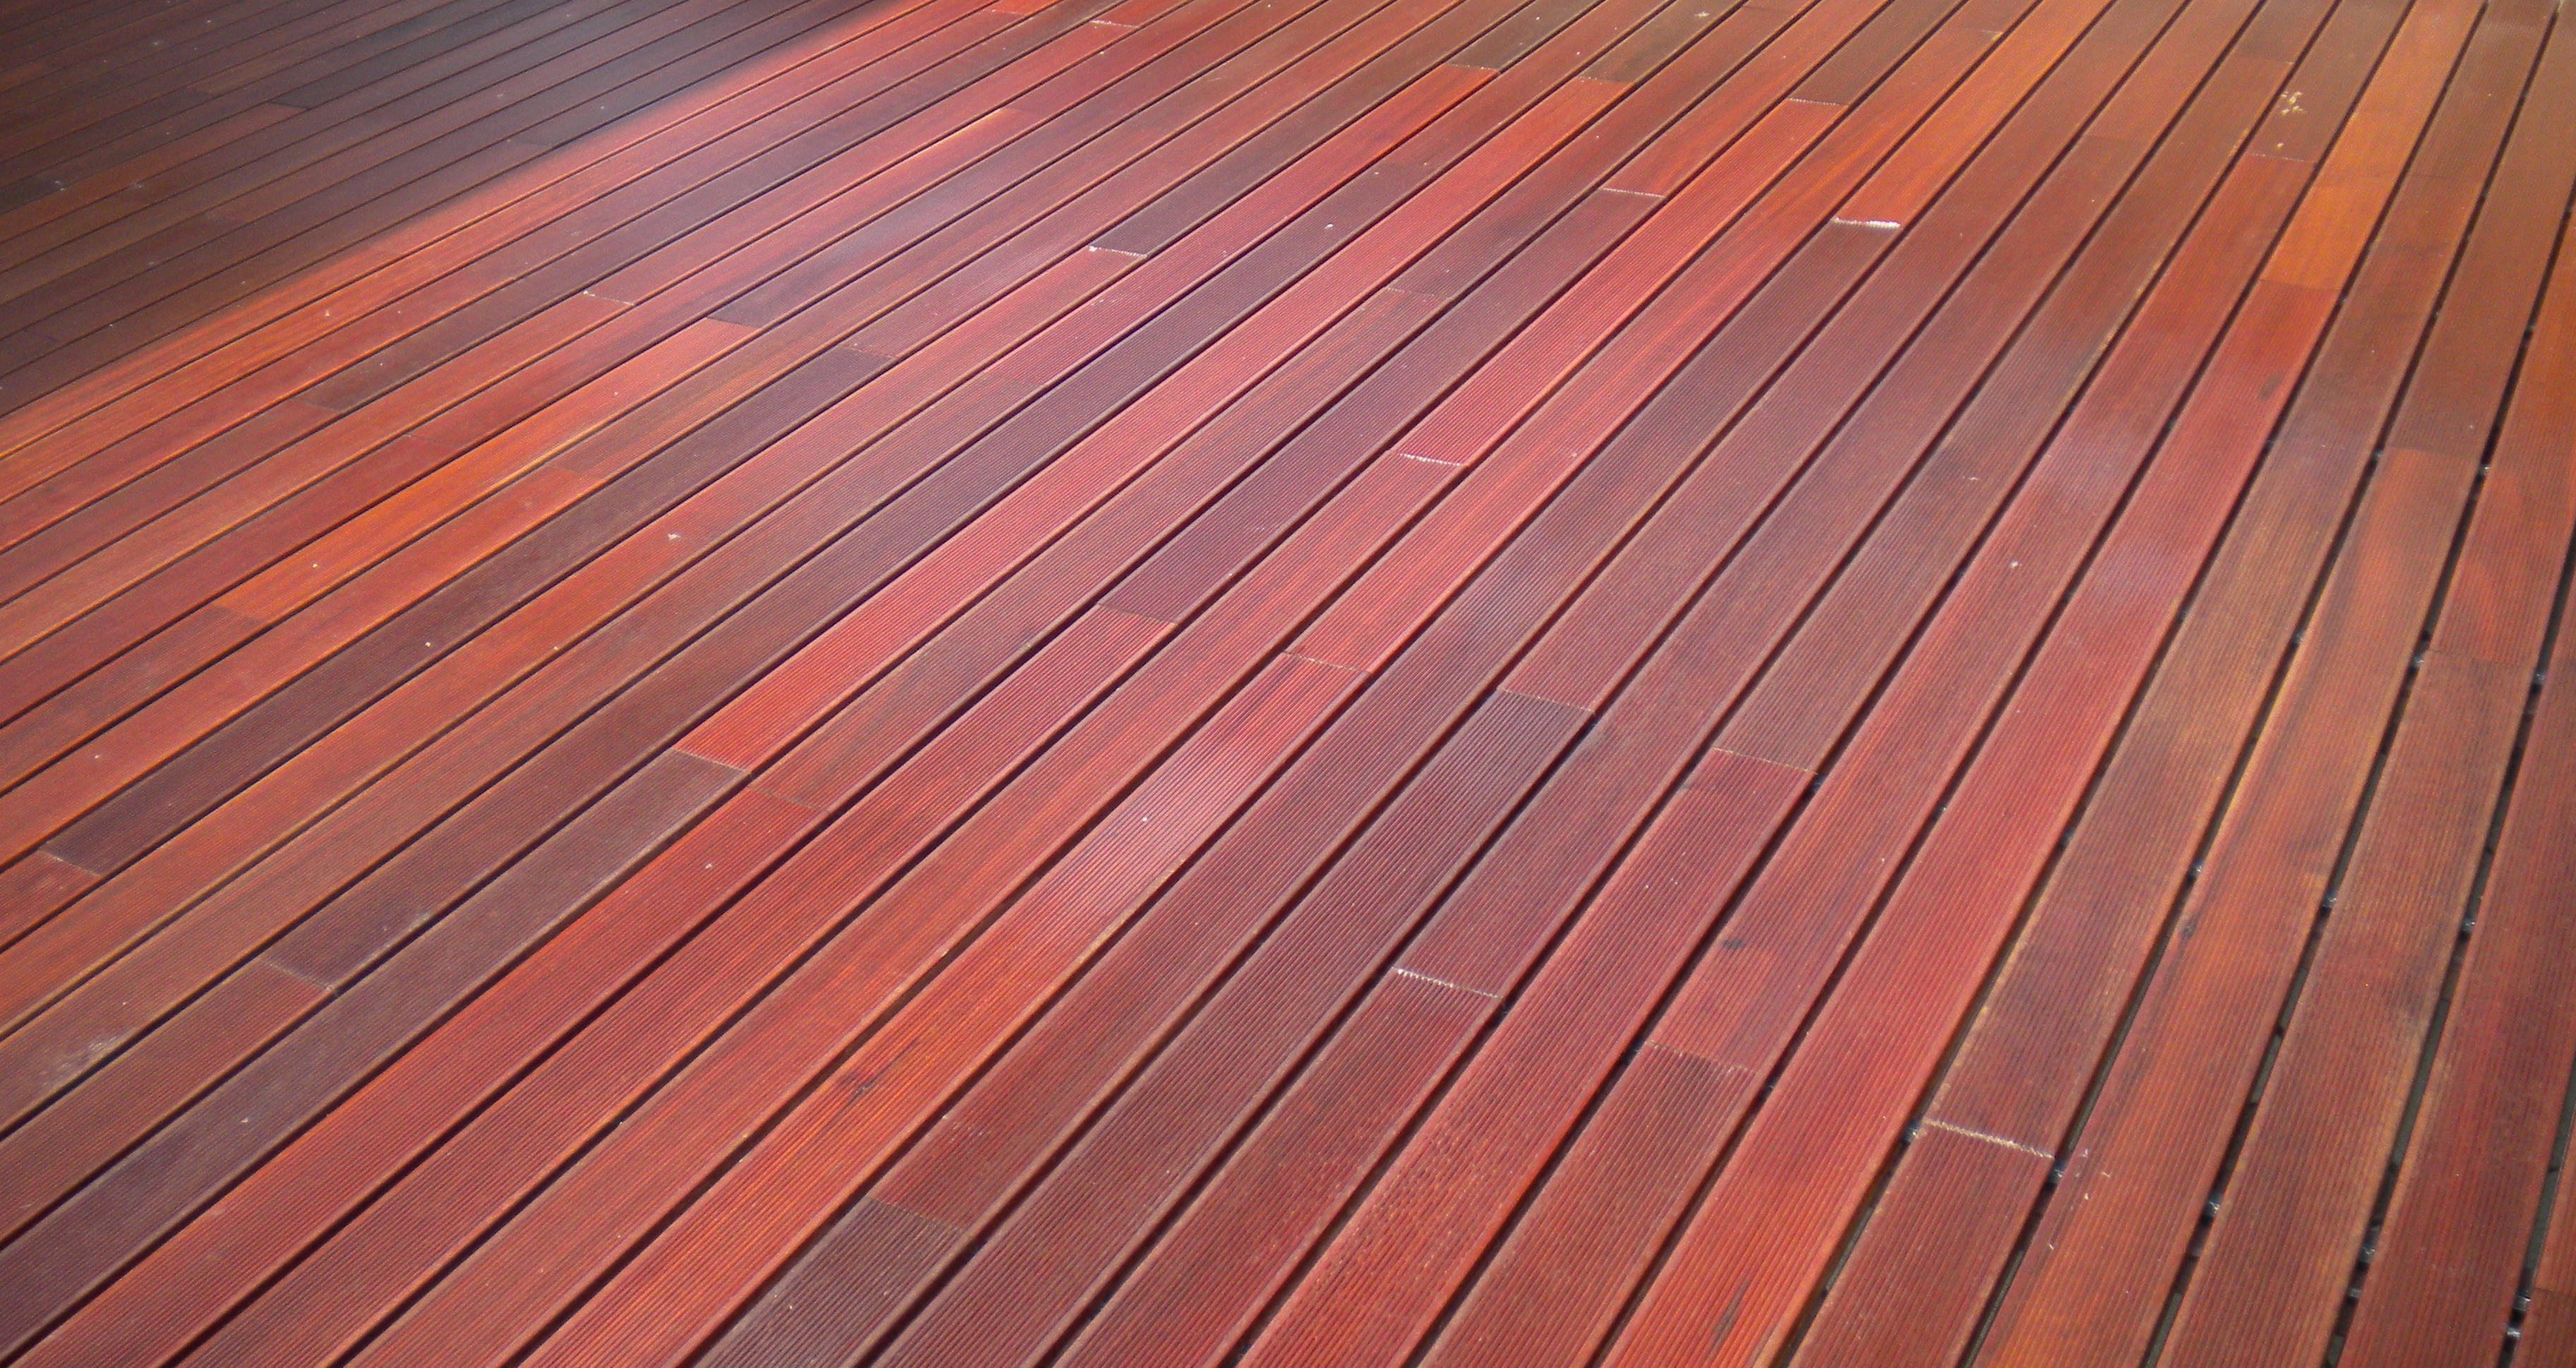 Deck-uri lemn - Massaranduba SELVA FLOORS - Poza 23